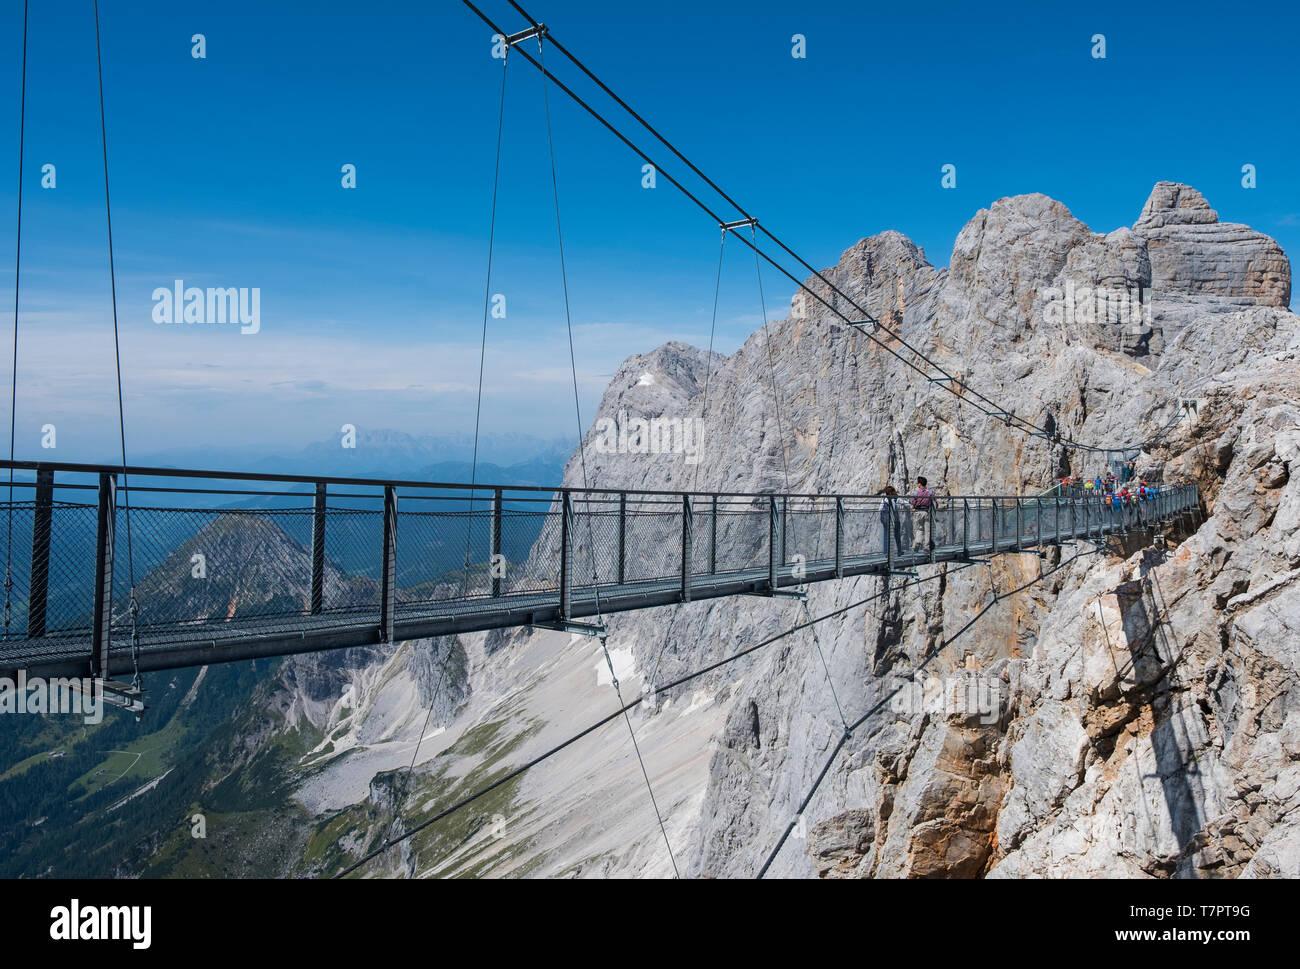 The Dachstein Suspension Bridge Stock Photo   Alamy